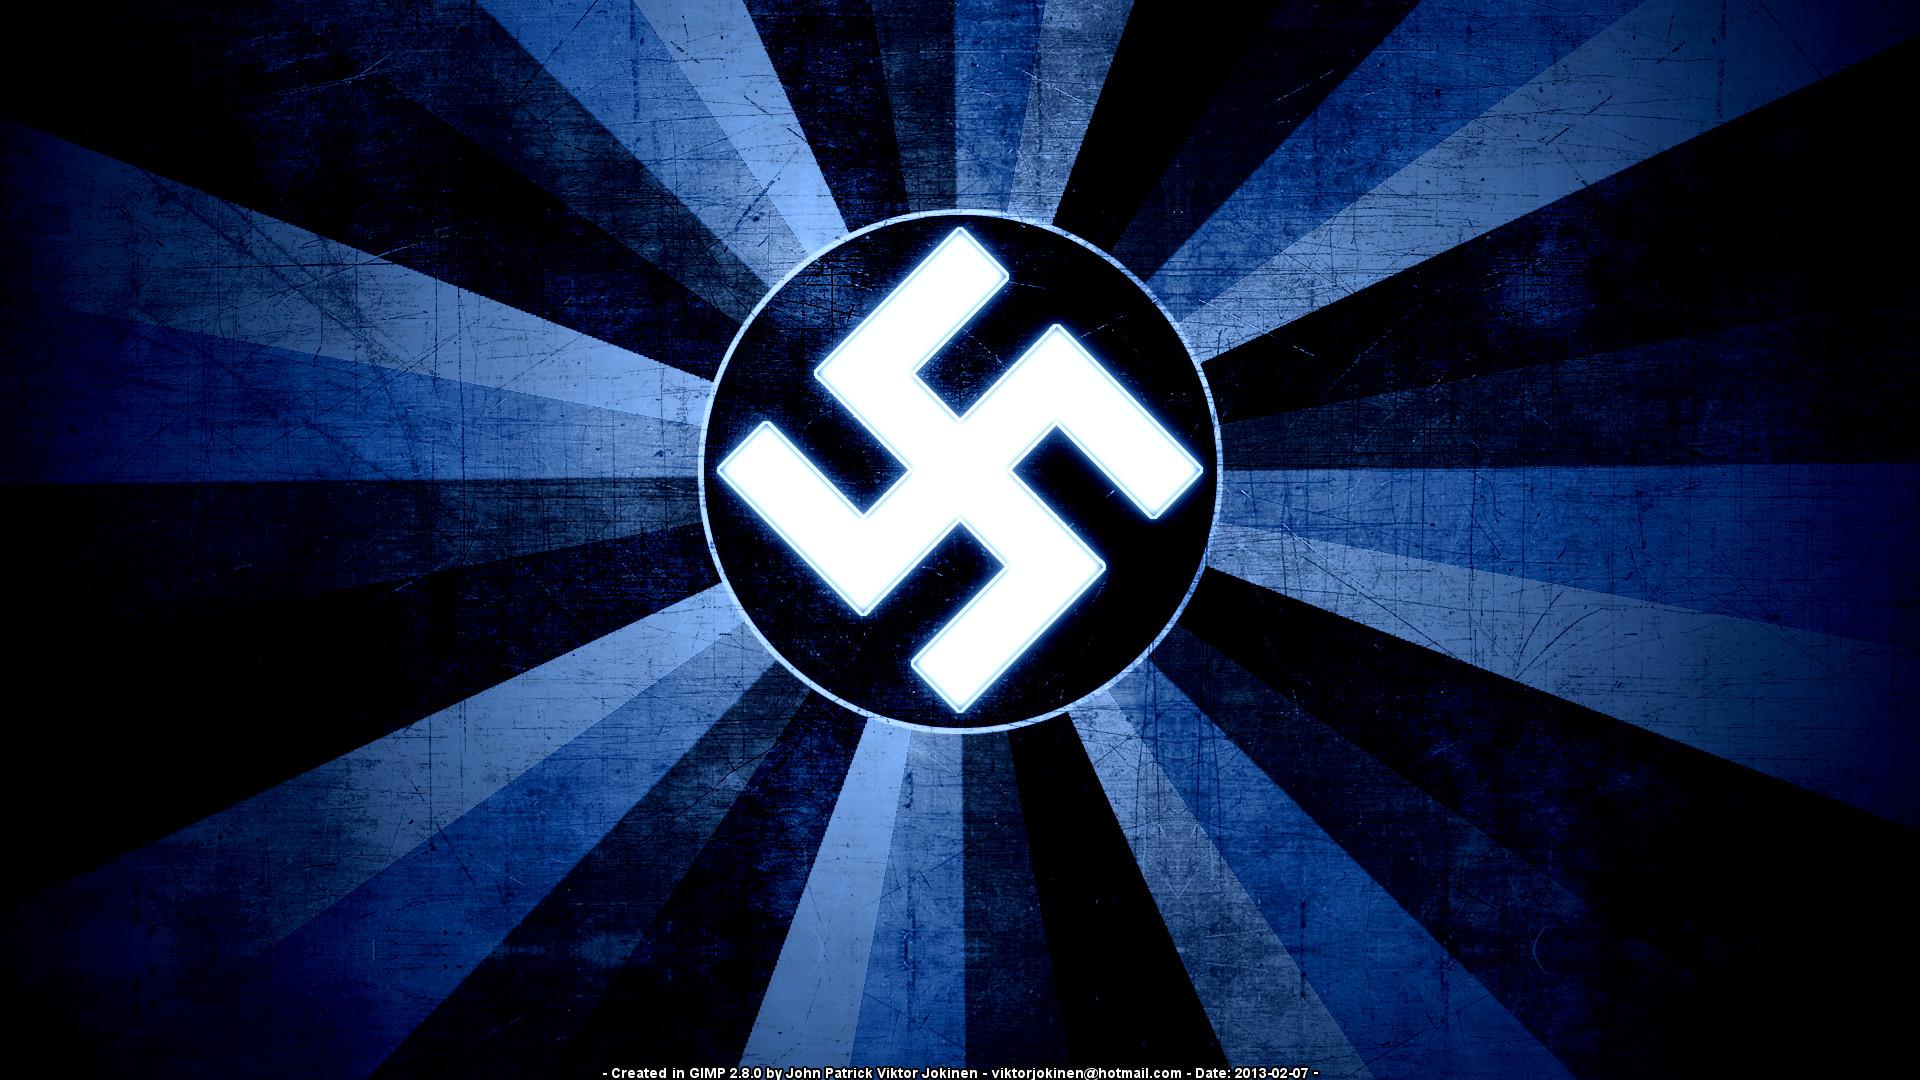 swastika eagle wallpaper 61 images